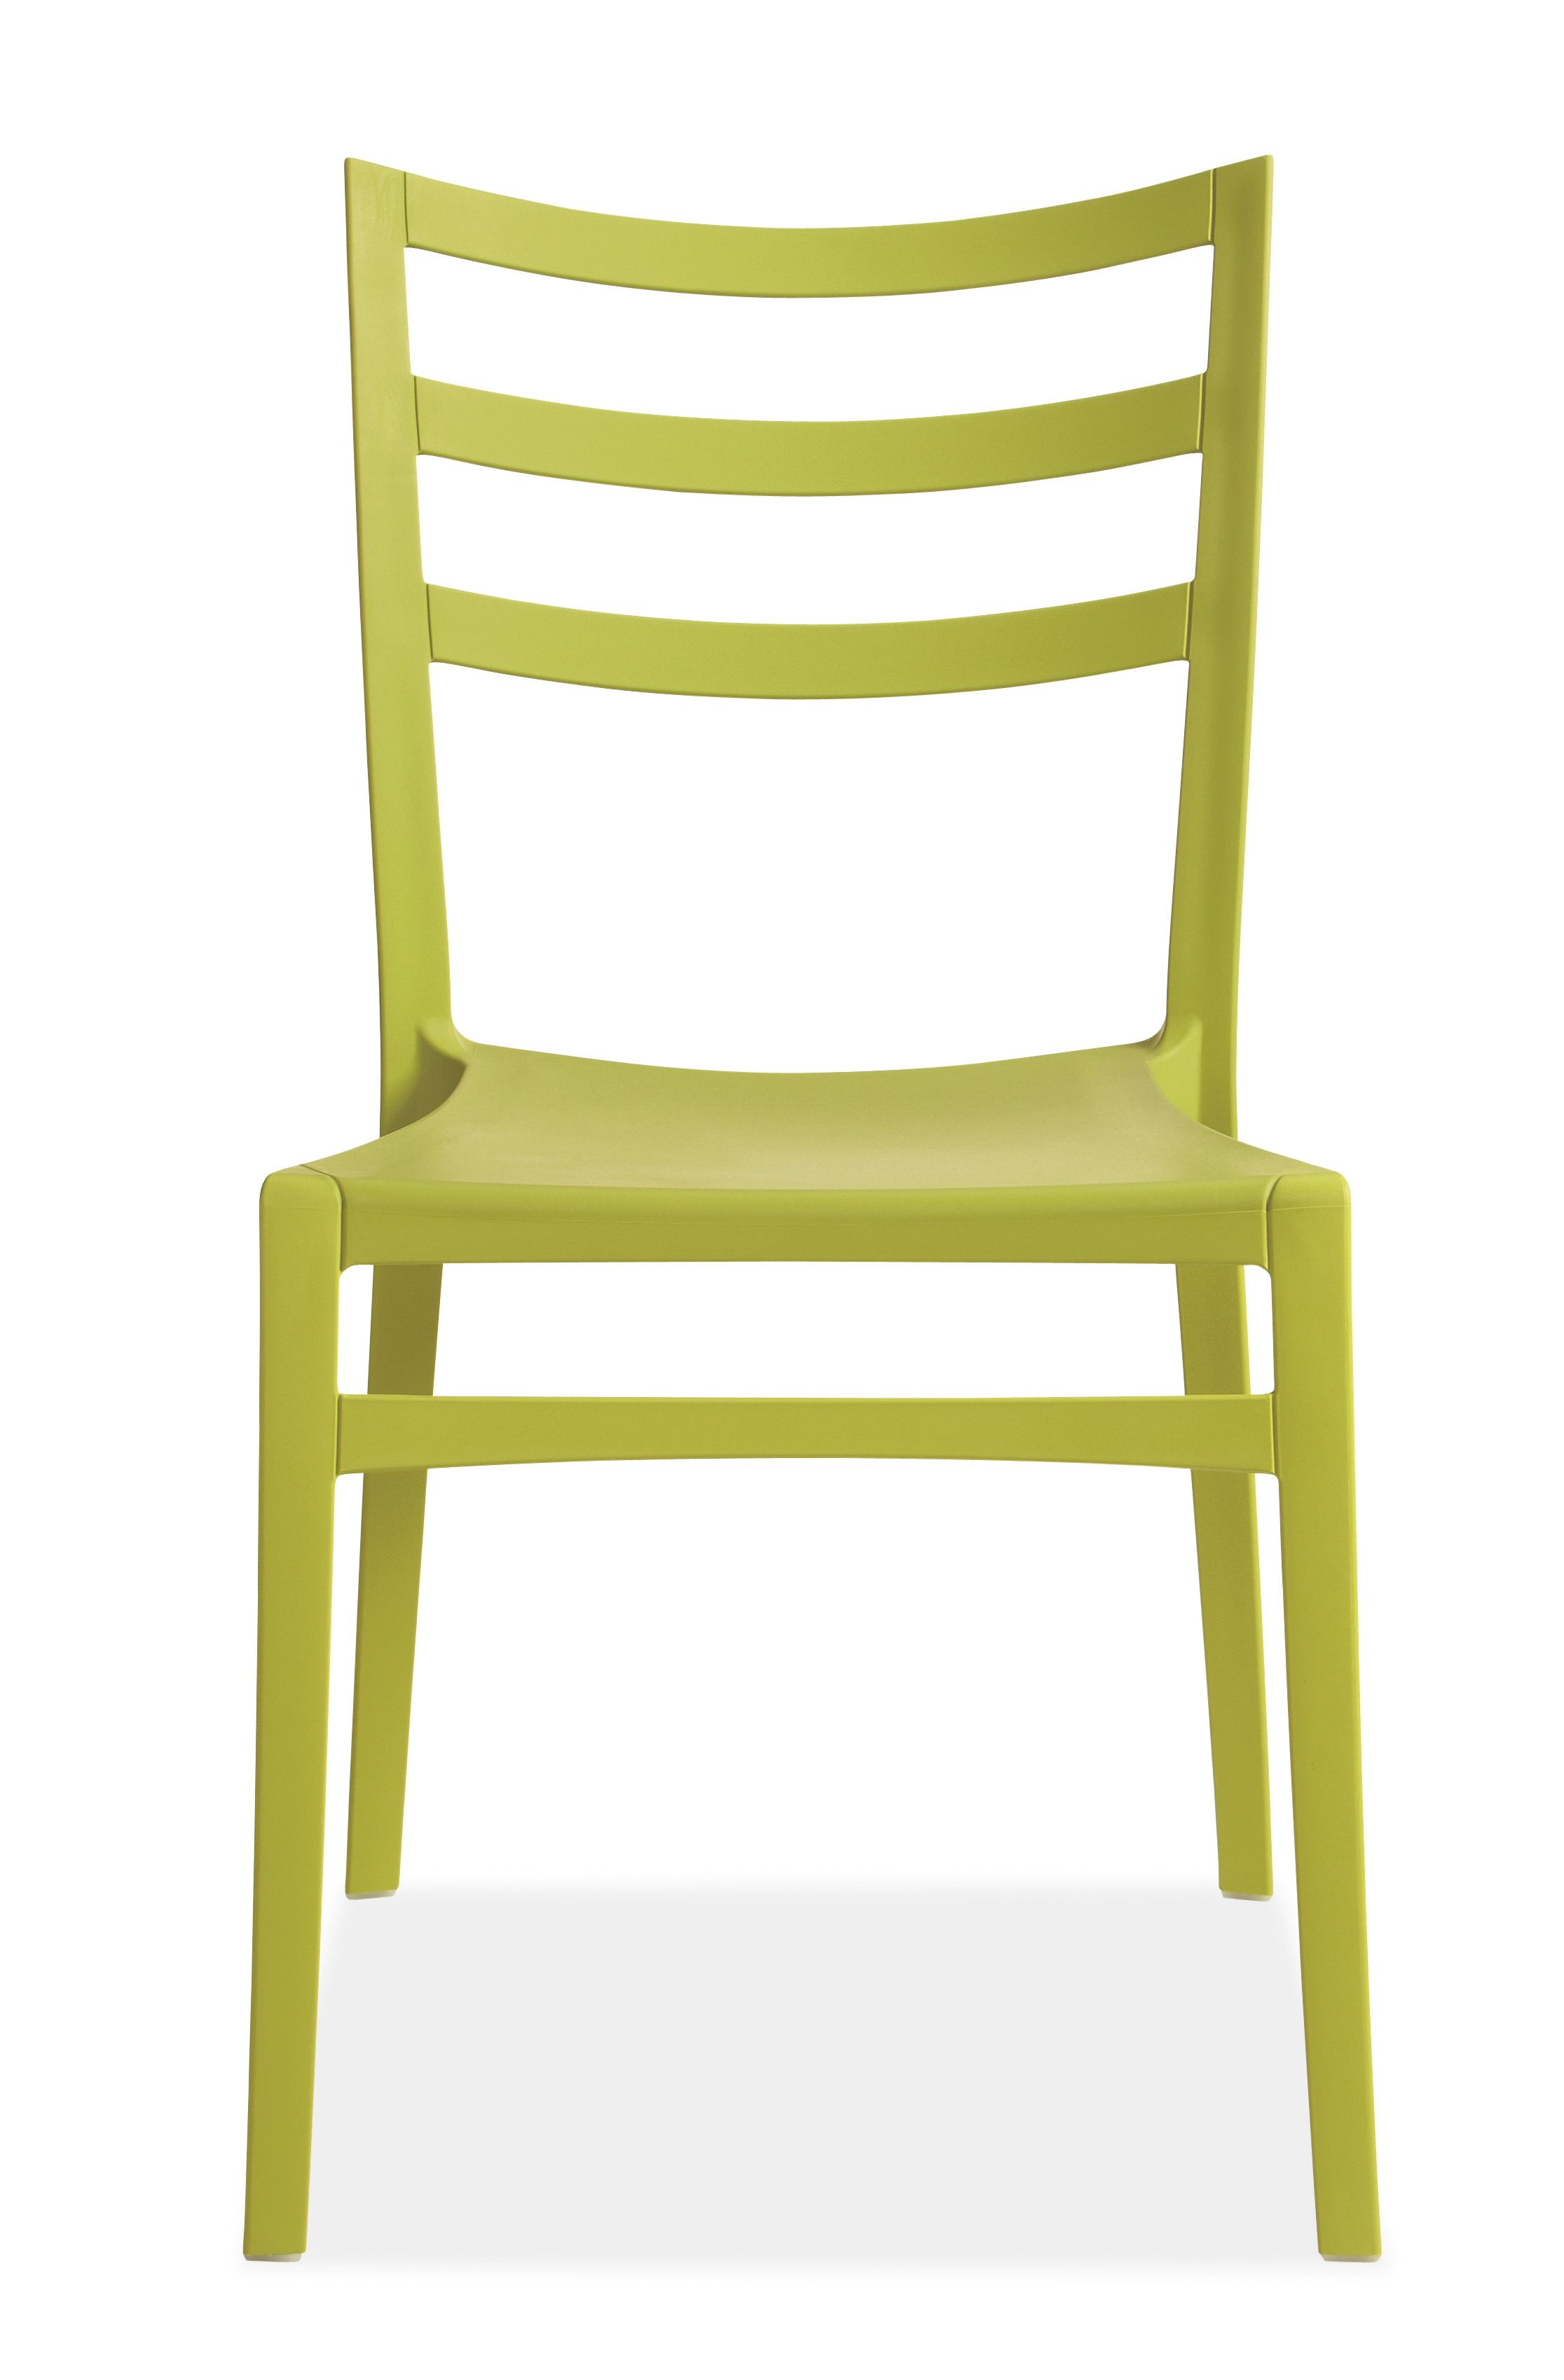 Outdoor dining chairs - Outdoor Dining Chairs 21